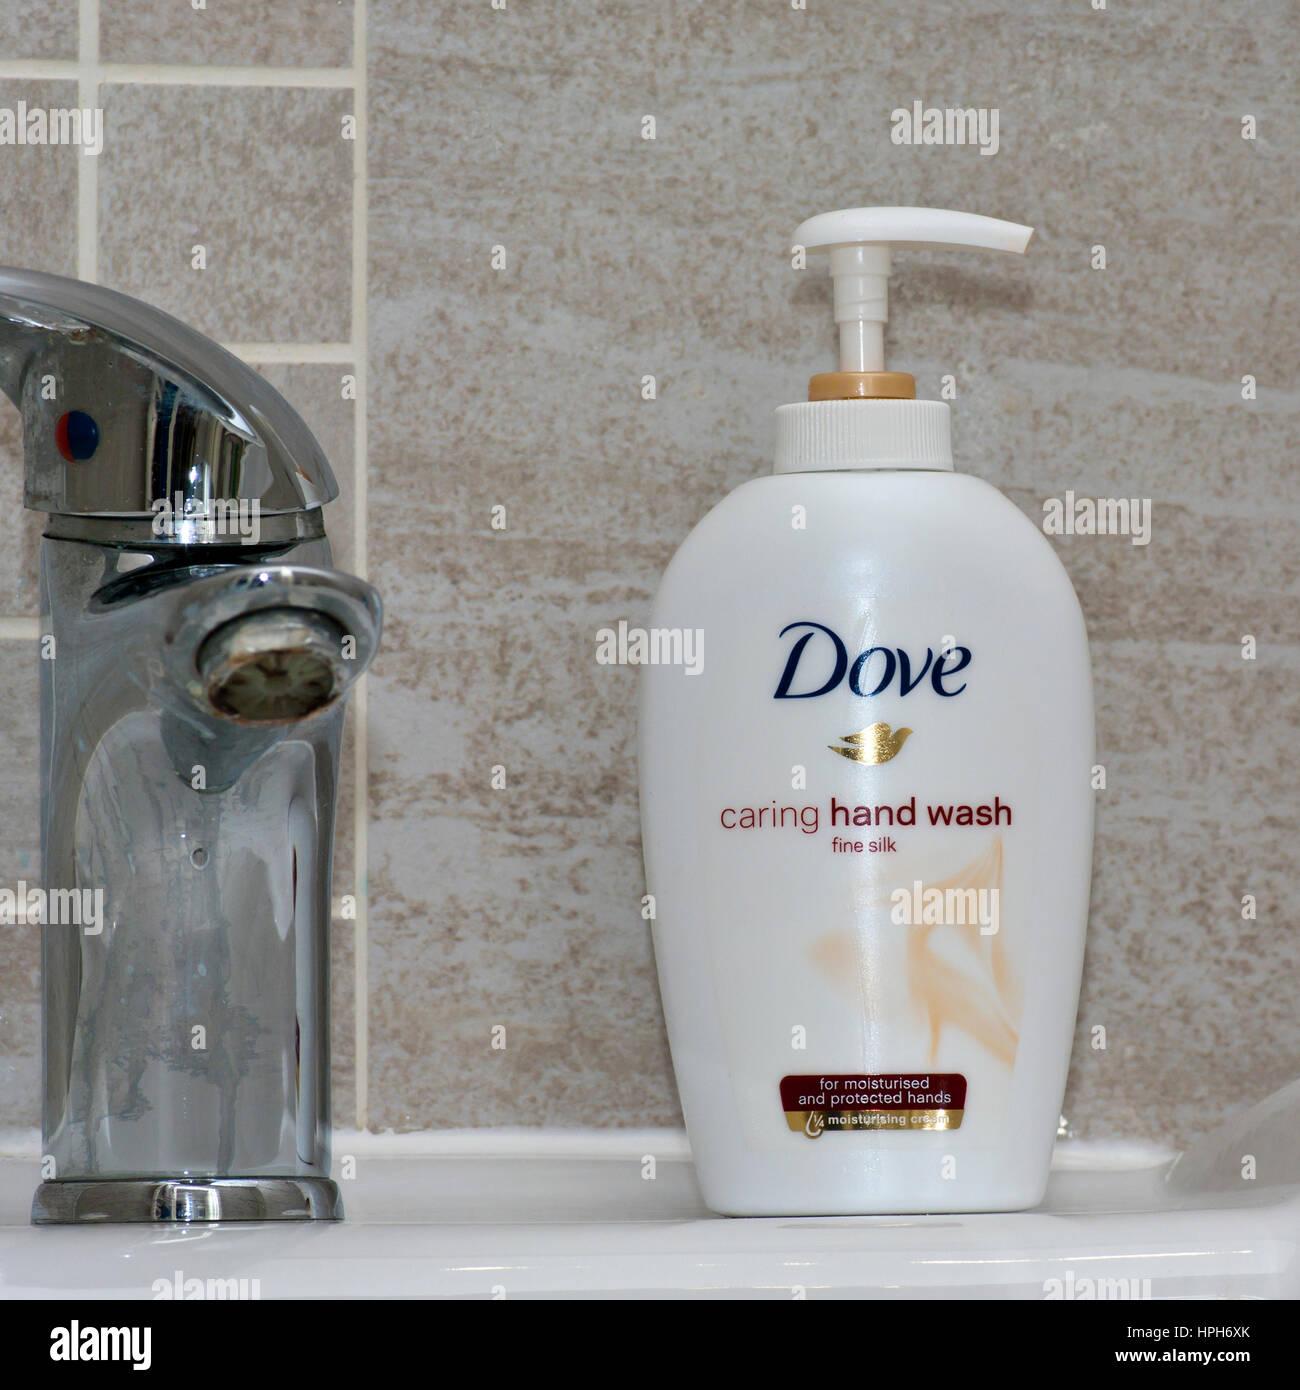 Plastic Bottle Of Dove Hand Wash - Stock Image